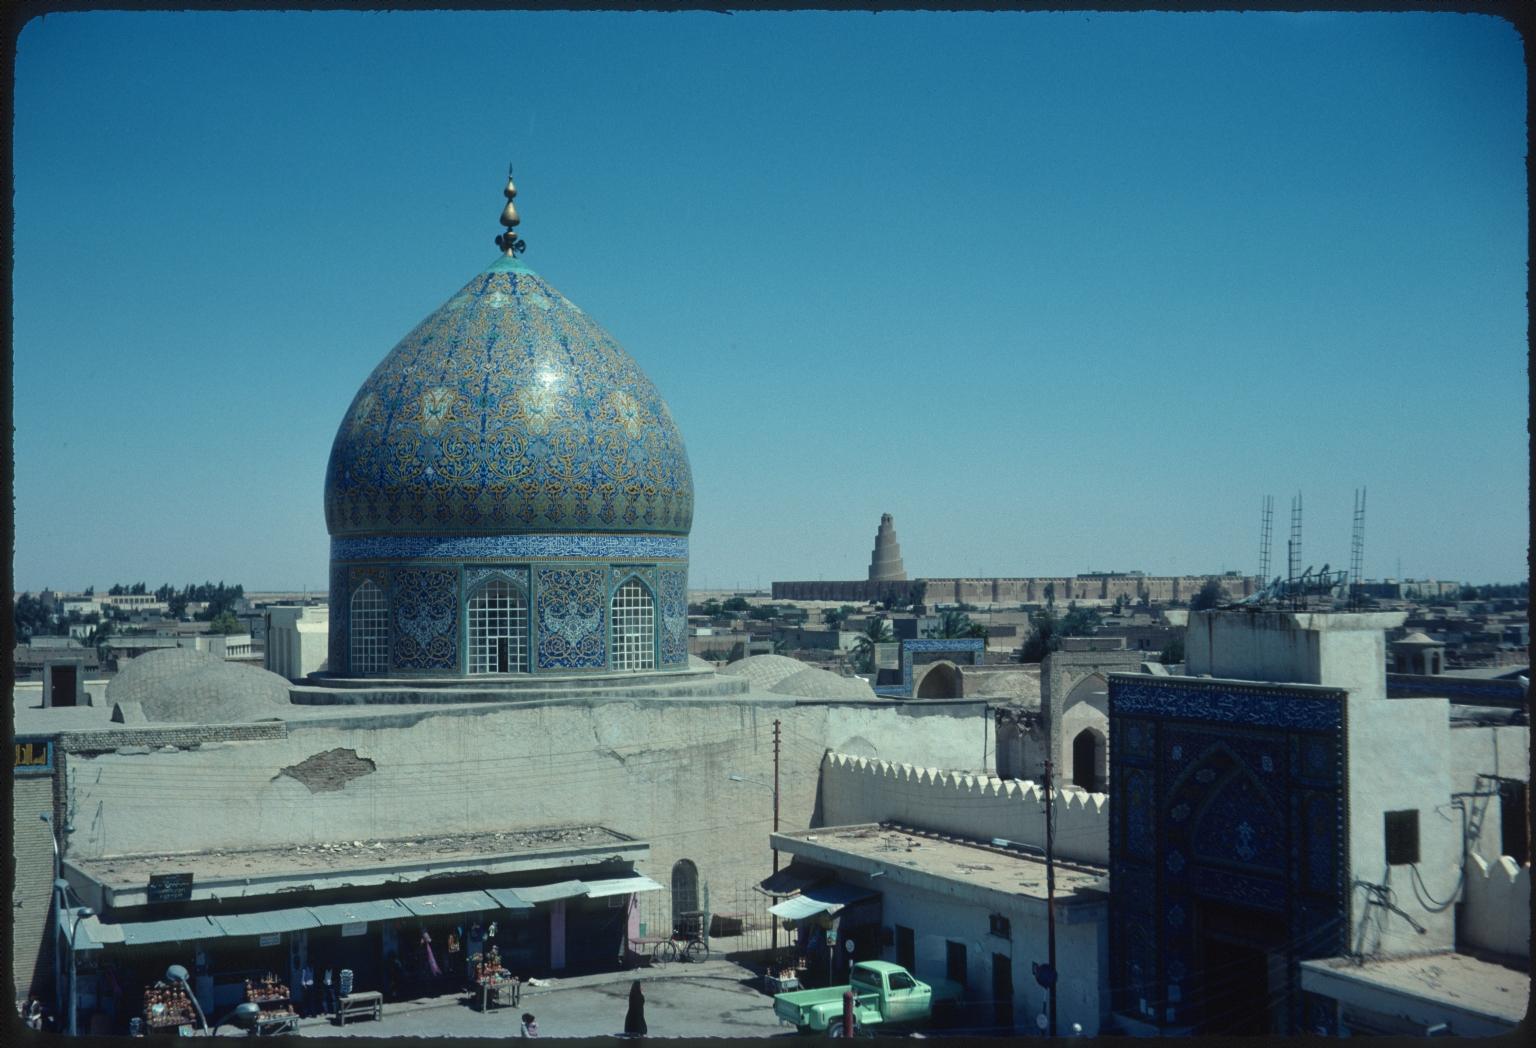 Al-Askari Shrine